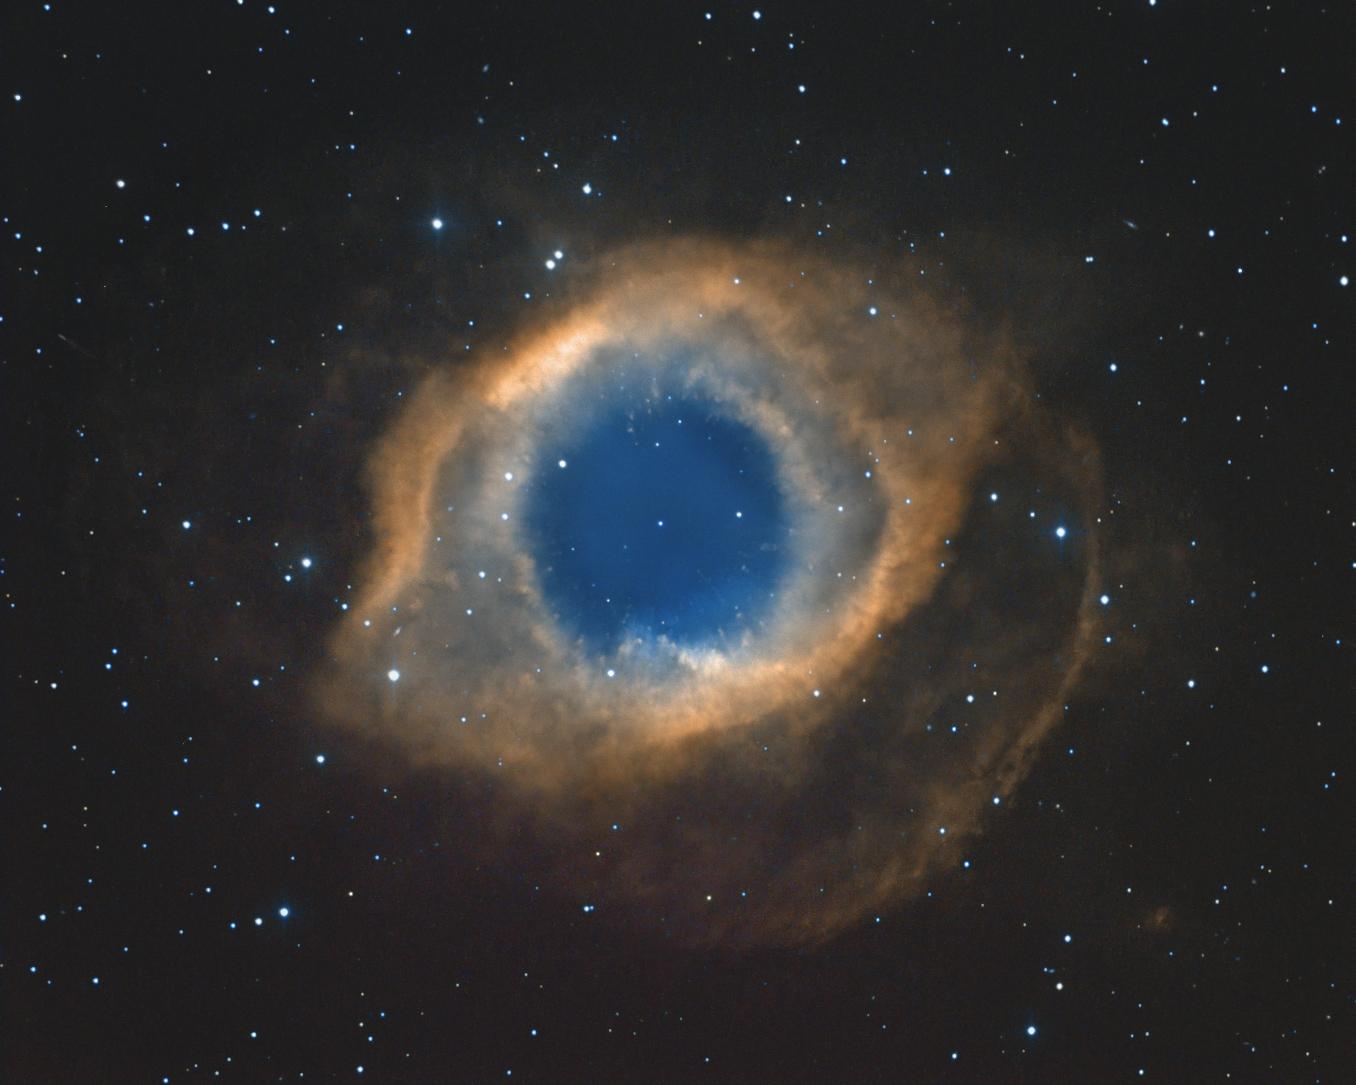 Une nouvelle helice 71_1534854716NGC7293Ha-arcsin-sharp-b-v2